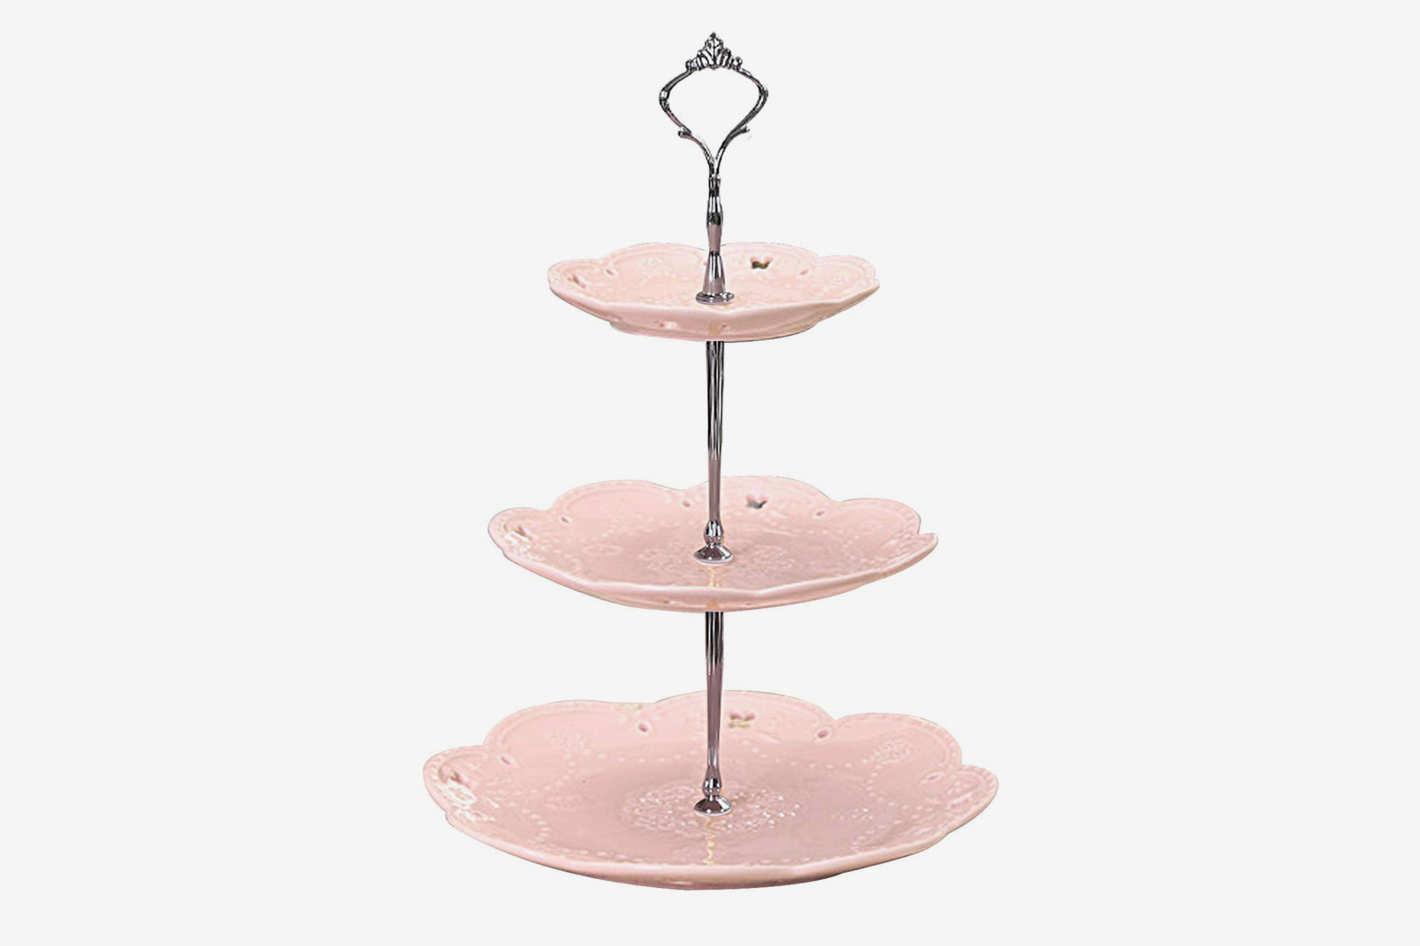 Jusalpha 3-Tier Ceramic Dessert Stand